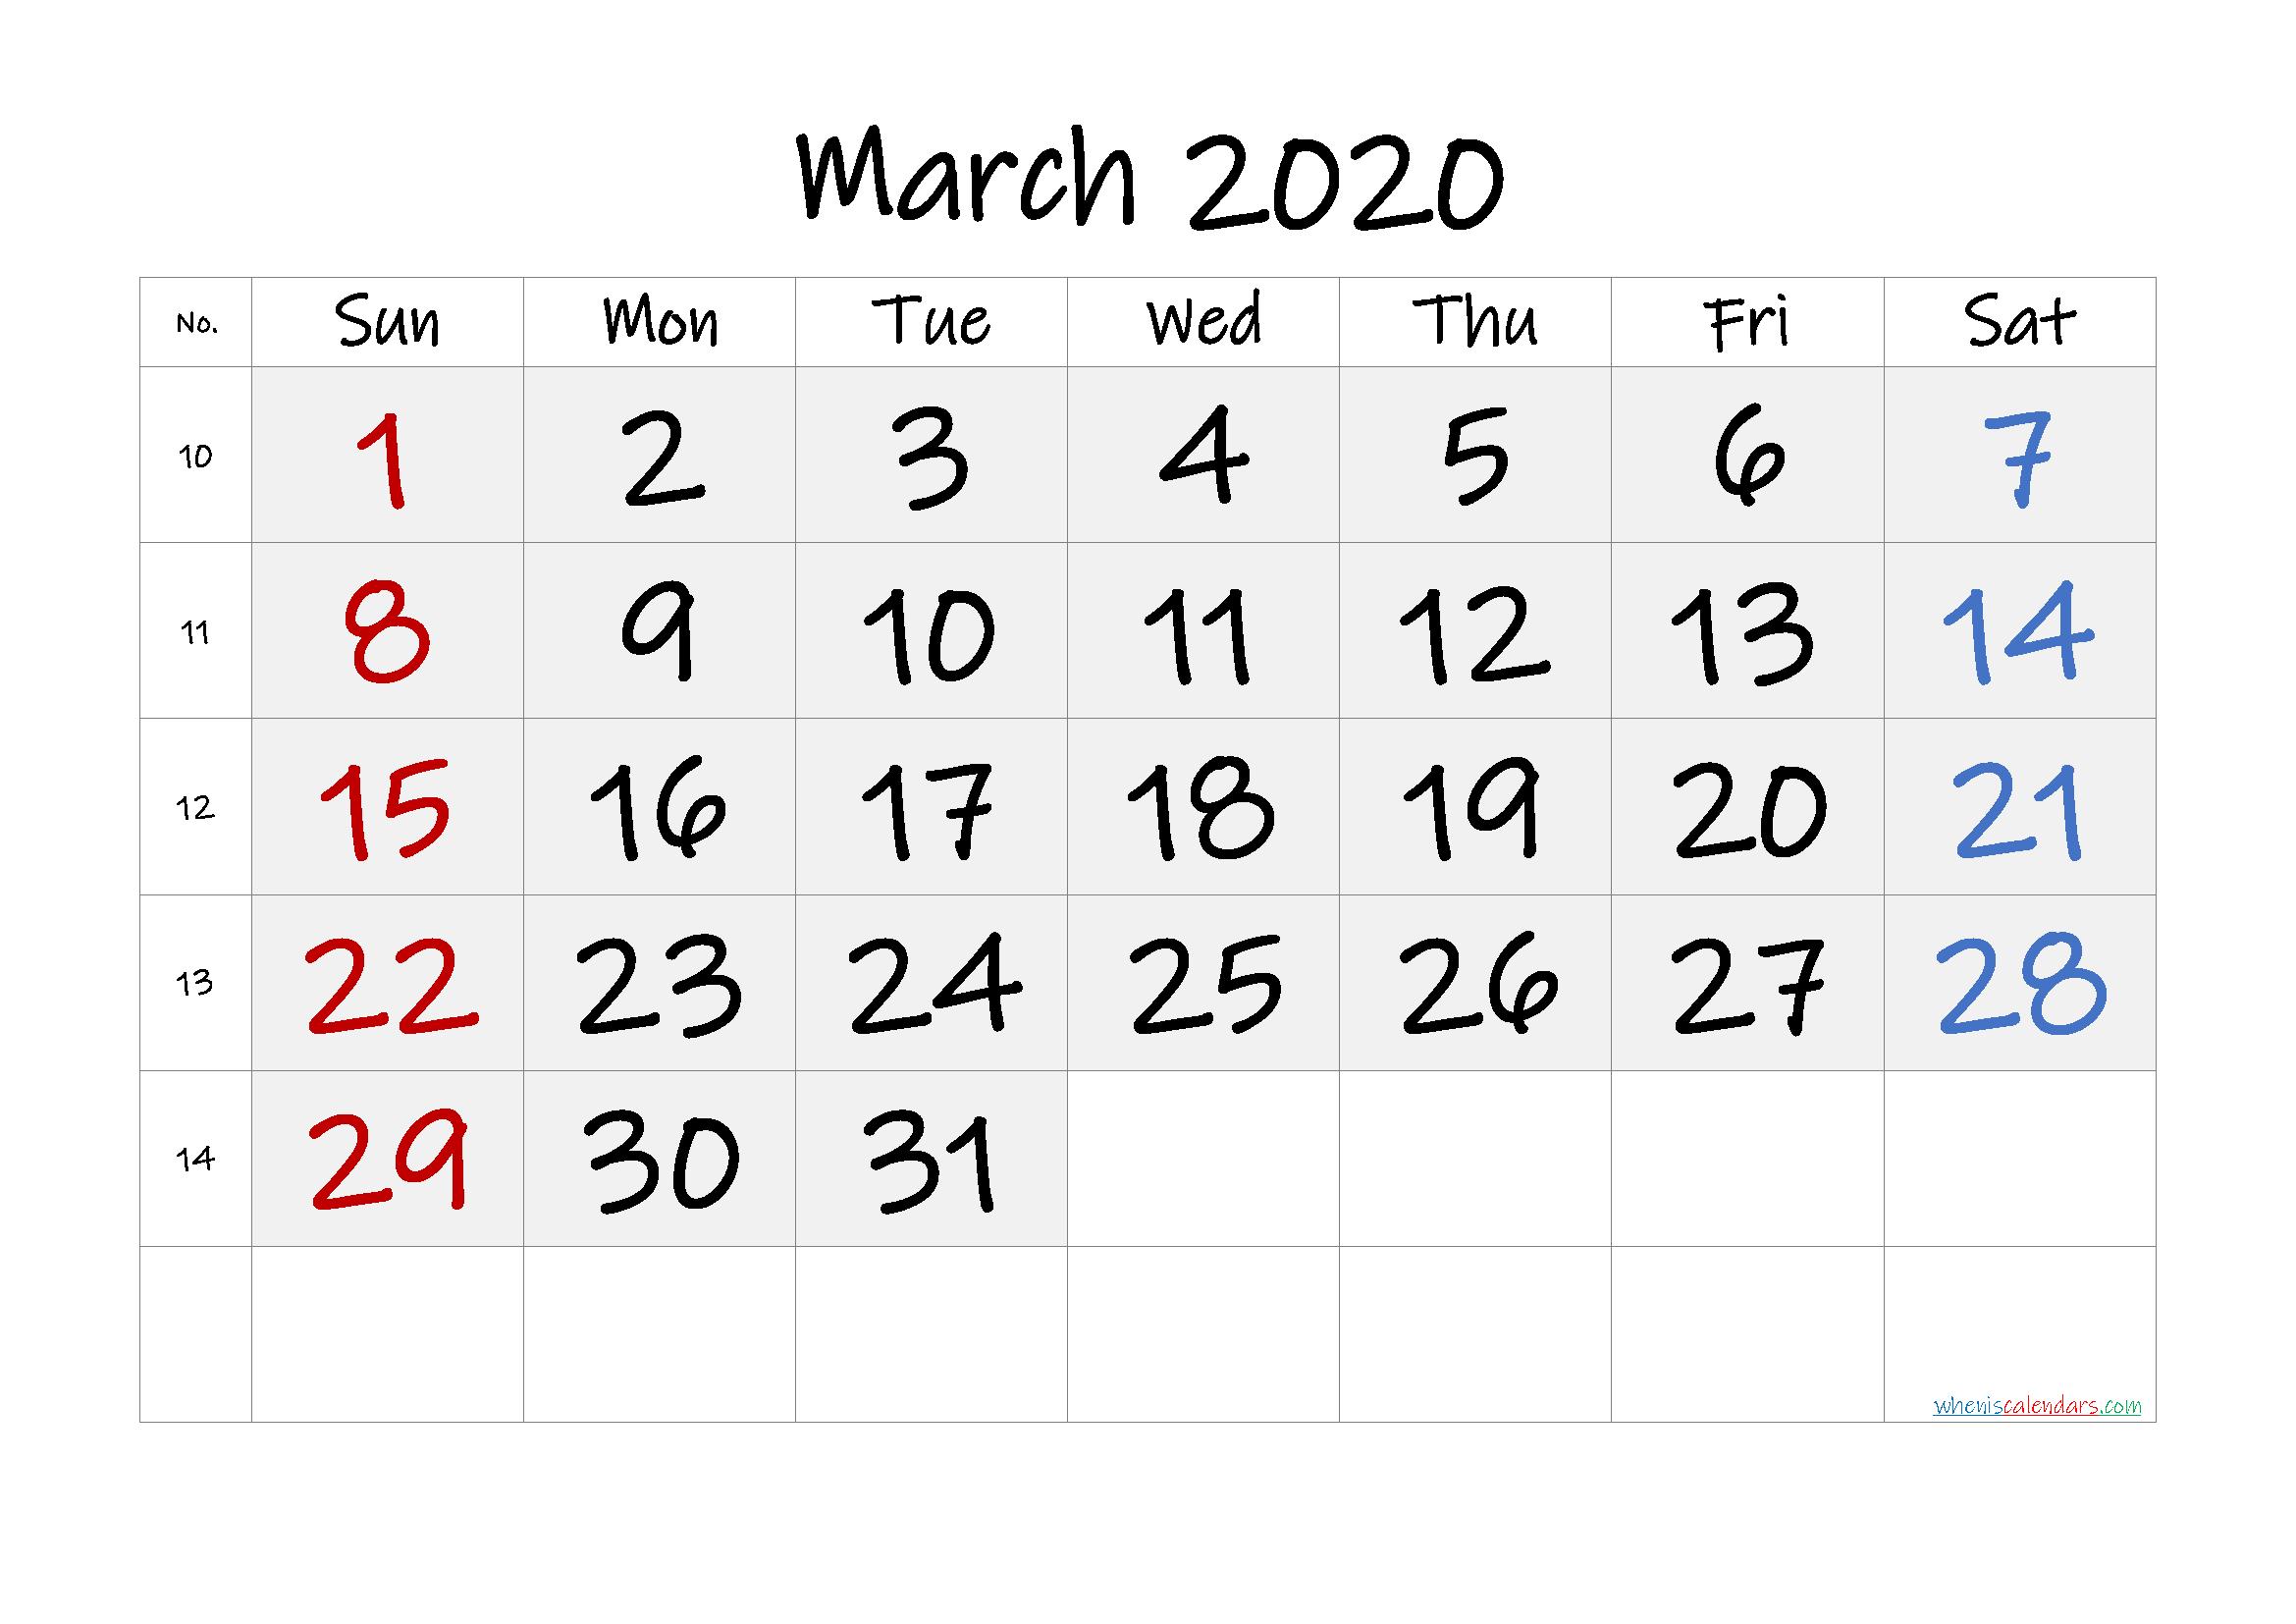 Free Printable March 2020 Calendar with Week Numbers